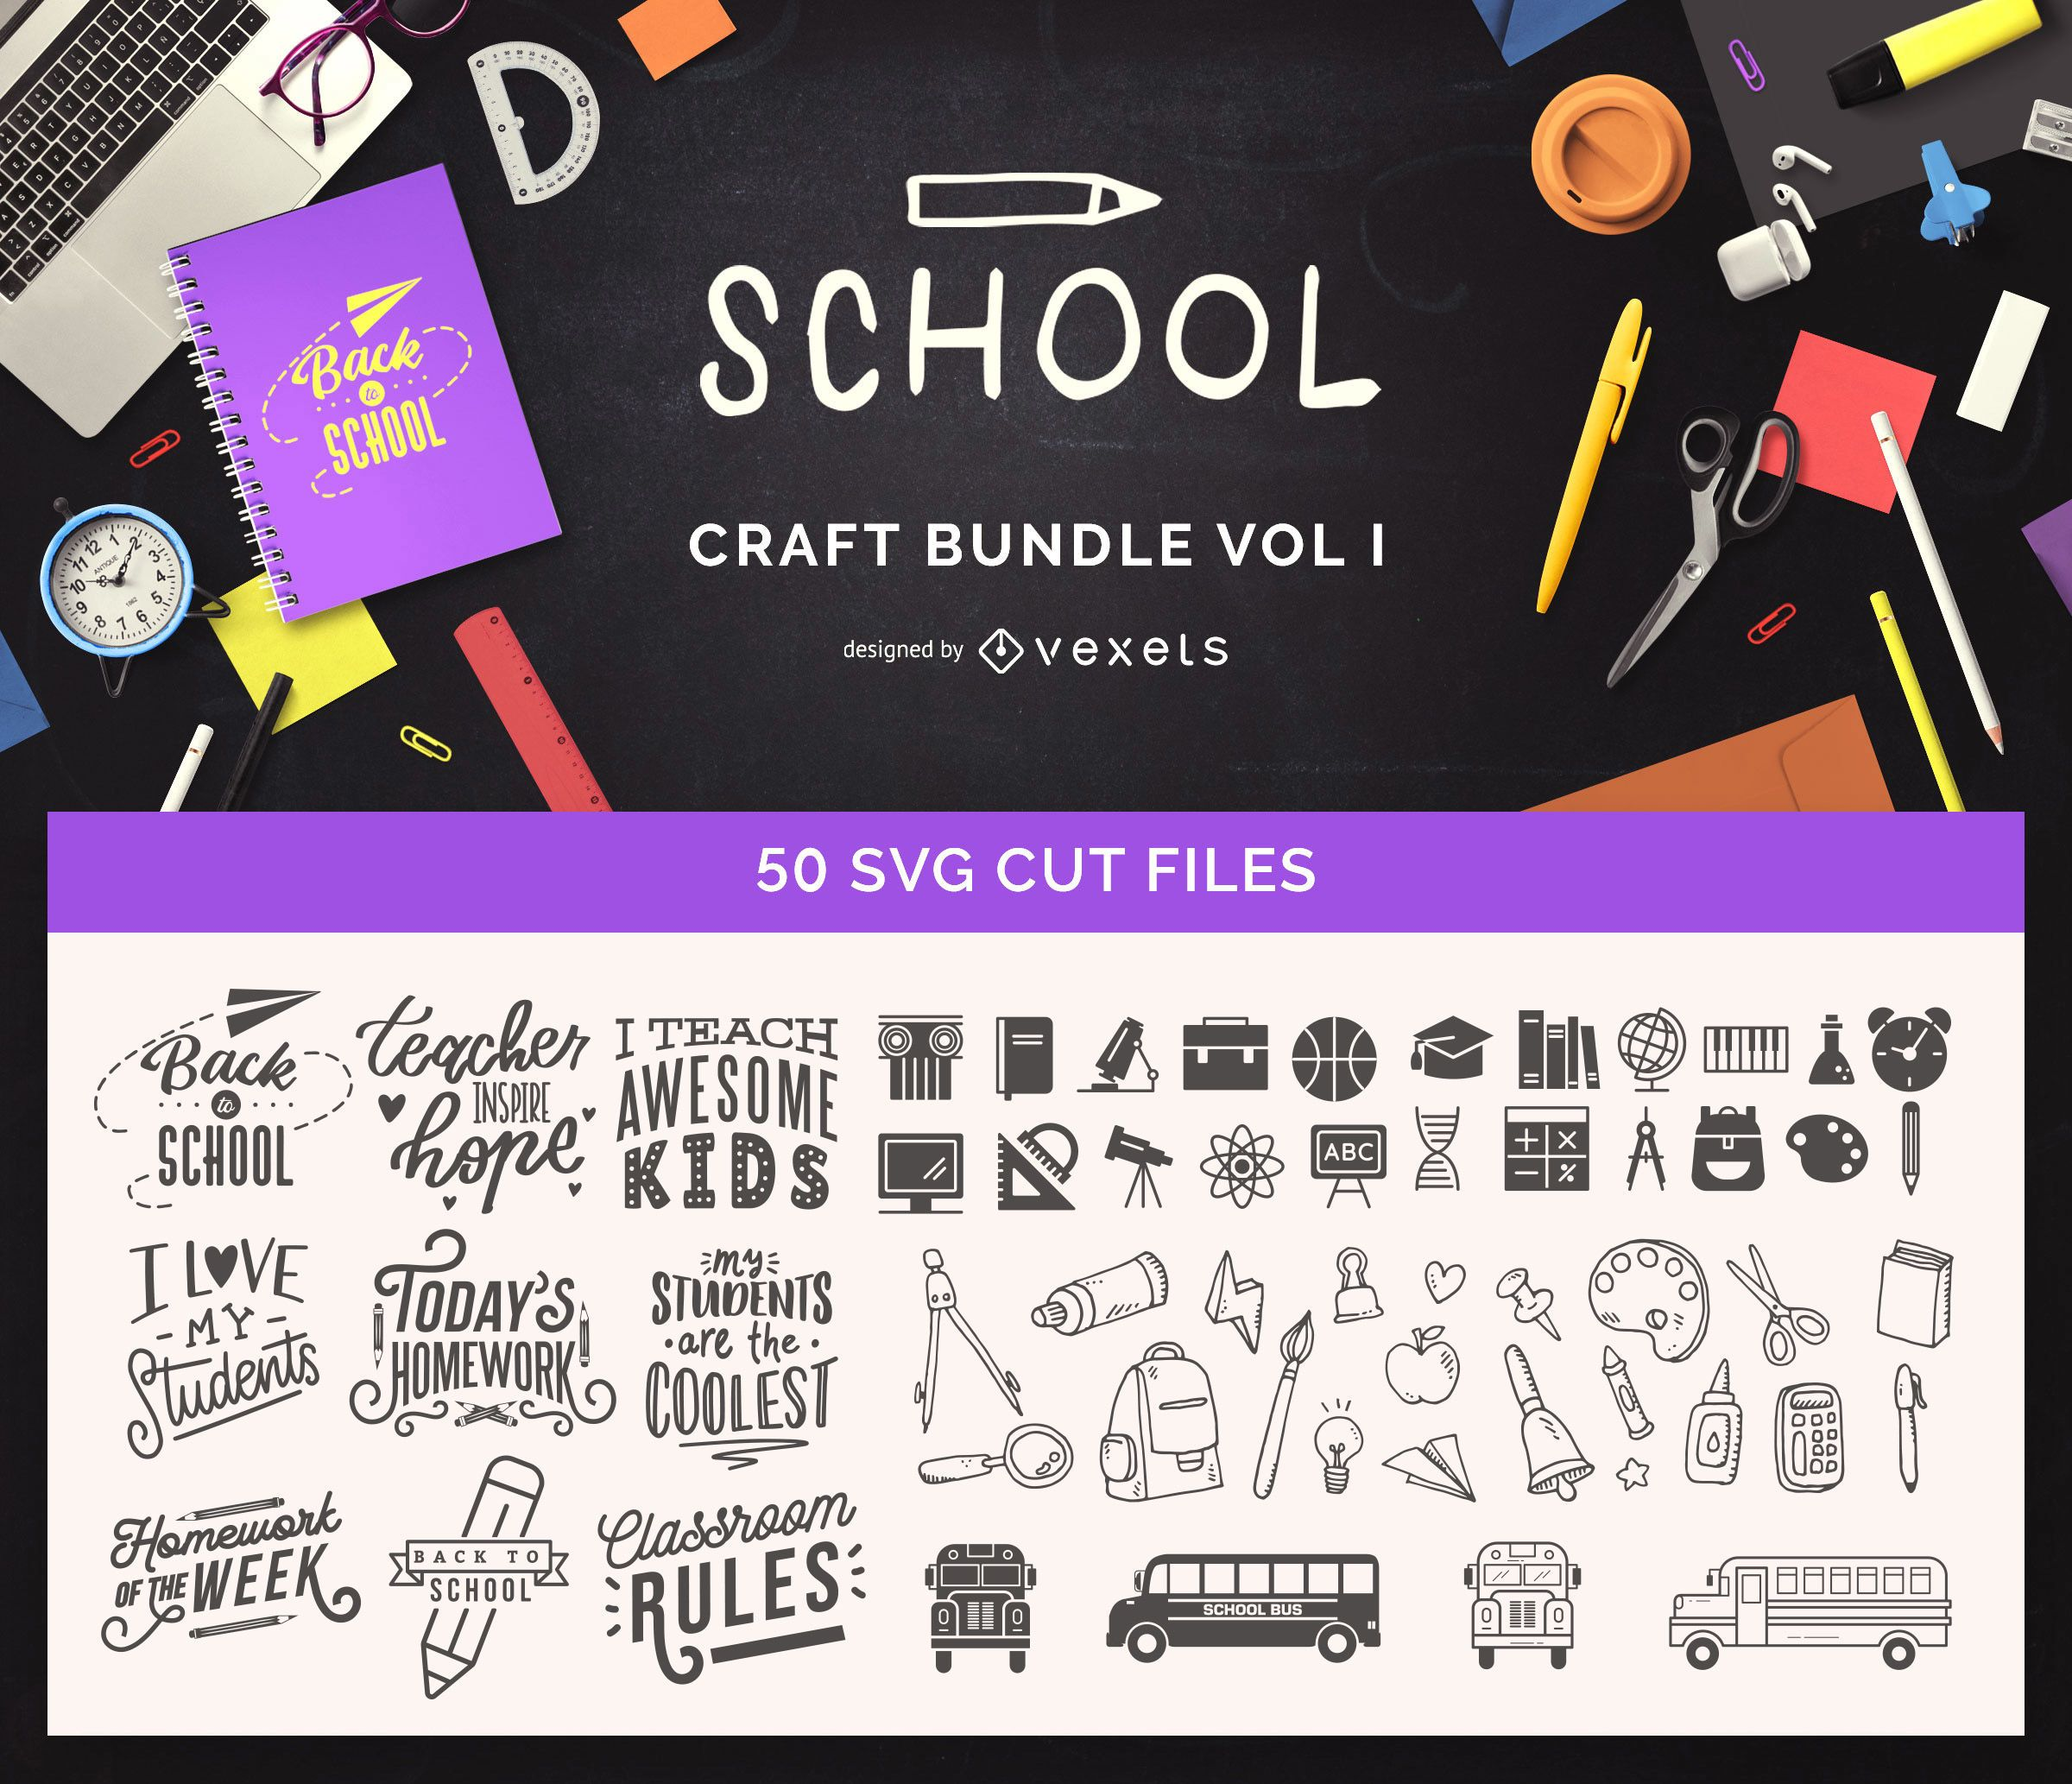 School Craft Bundle Vol I